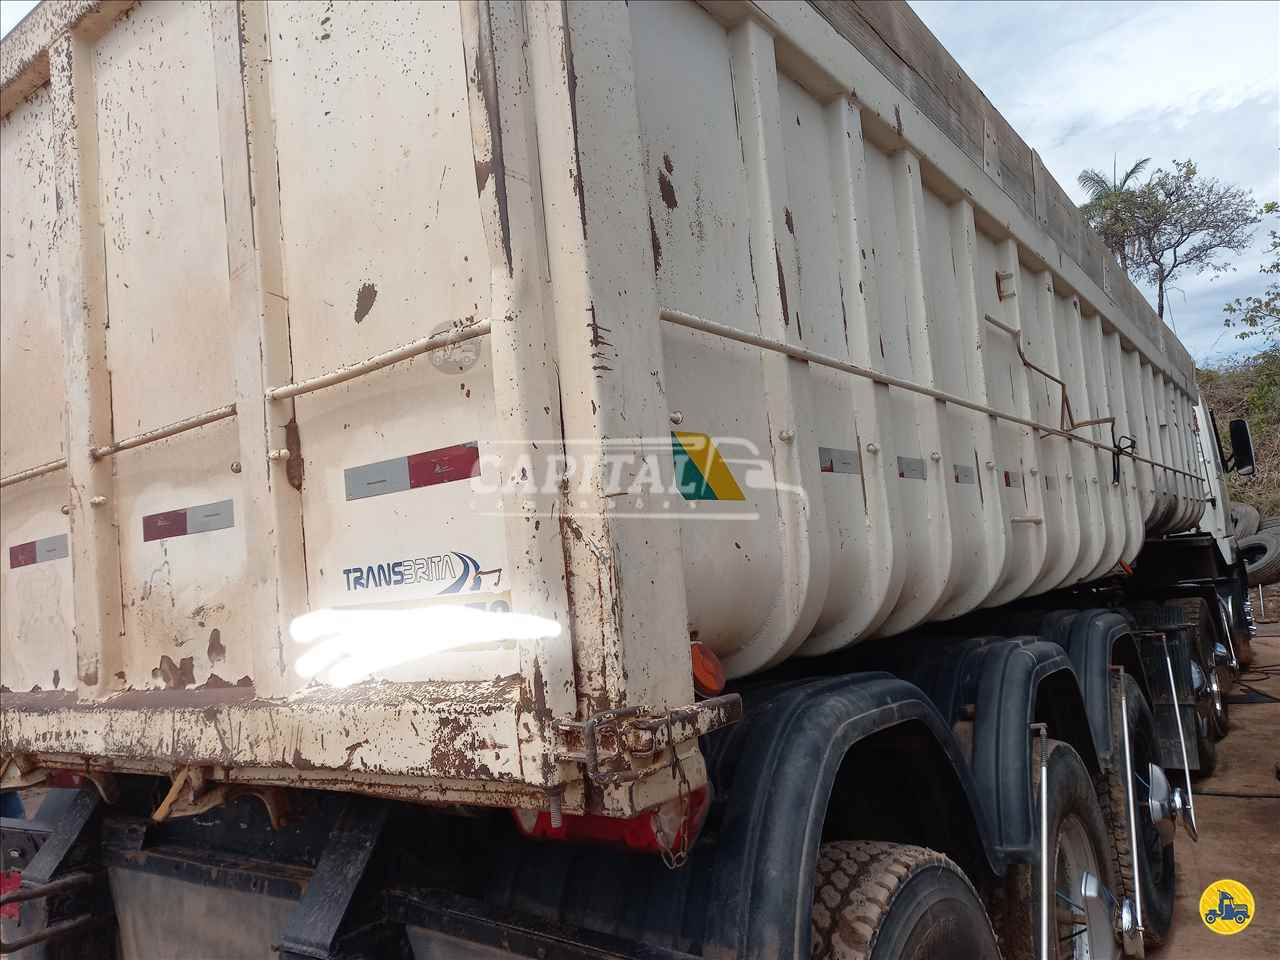 CARRETA SEMI-REBOQUE BASCULANTE Capital Caminhões - Metalesp e Recrusul  BRASILIA DISTRITO FEDERAL DF